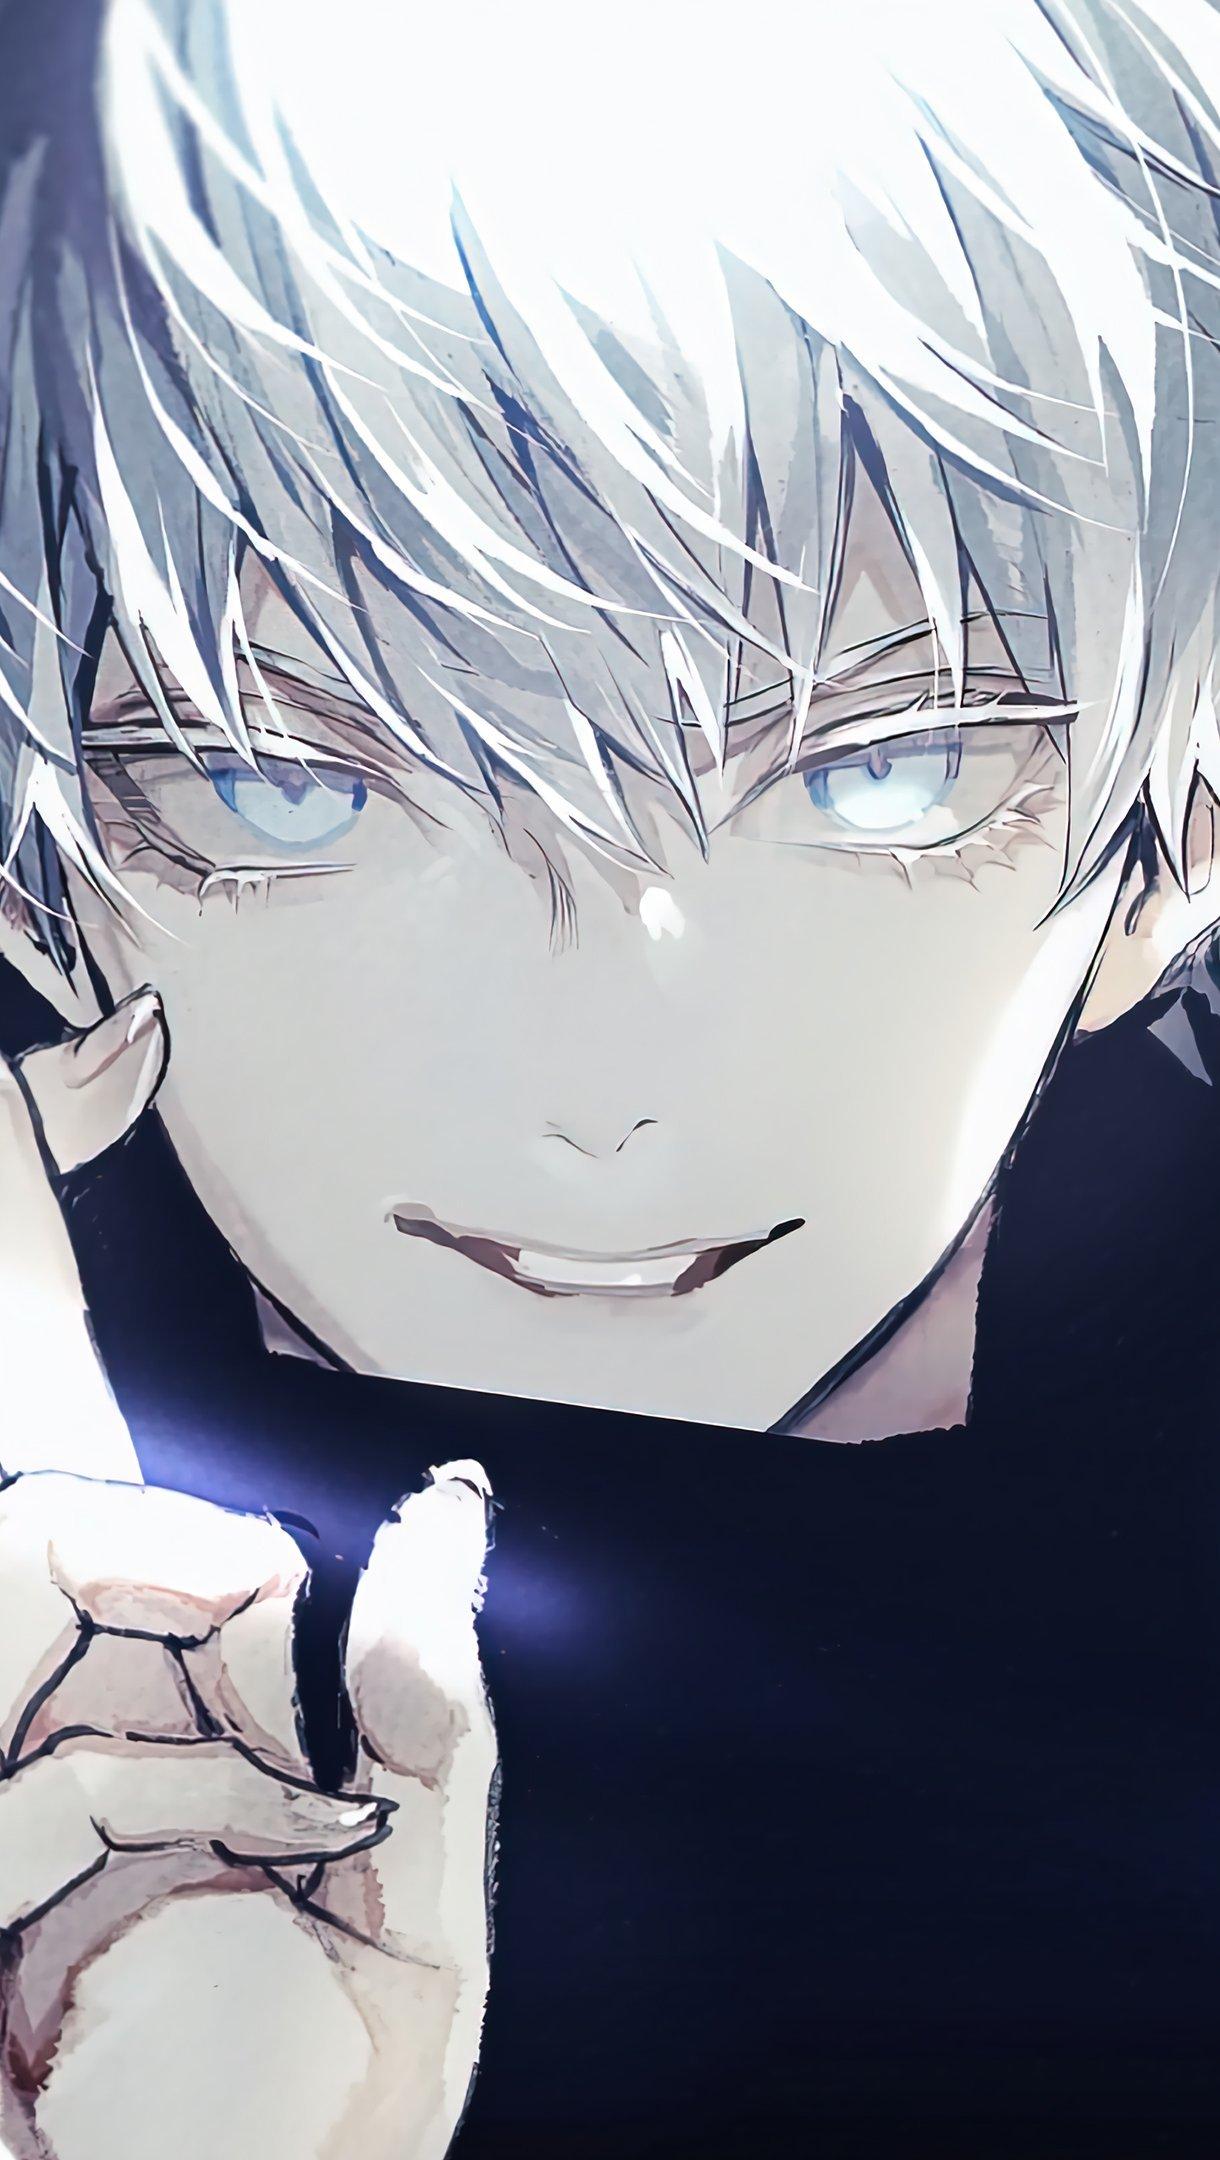 Fondos de pantalla Anime Satoru Gojo de Jujutsu Kaisen Vertical